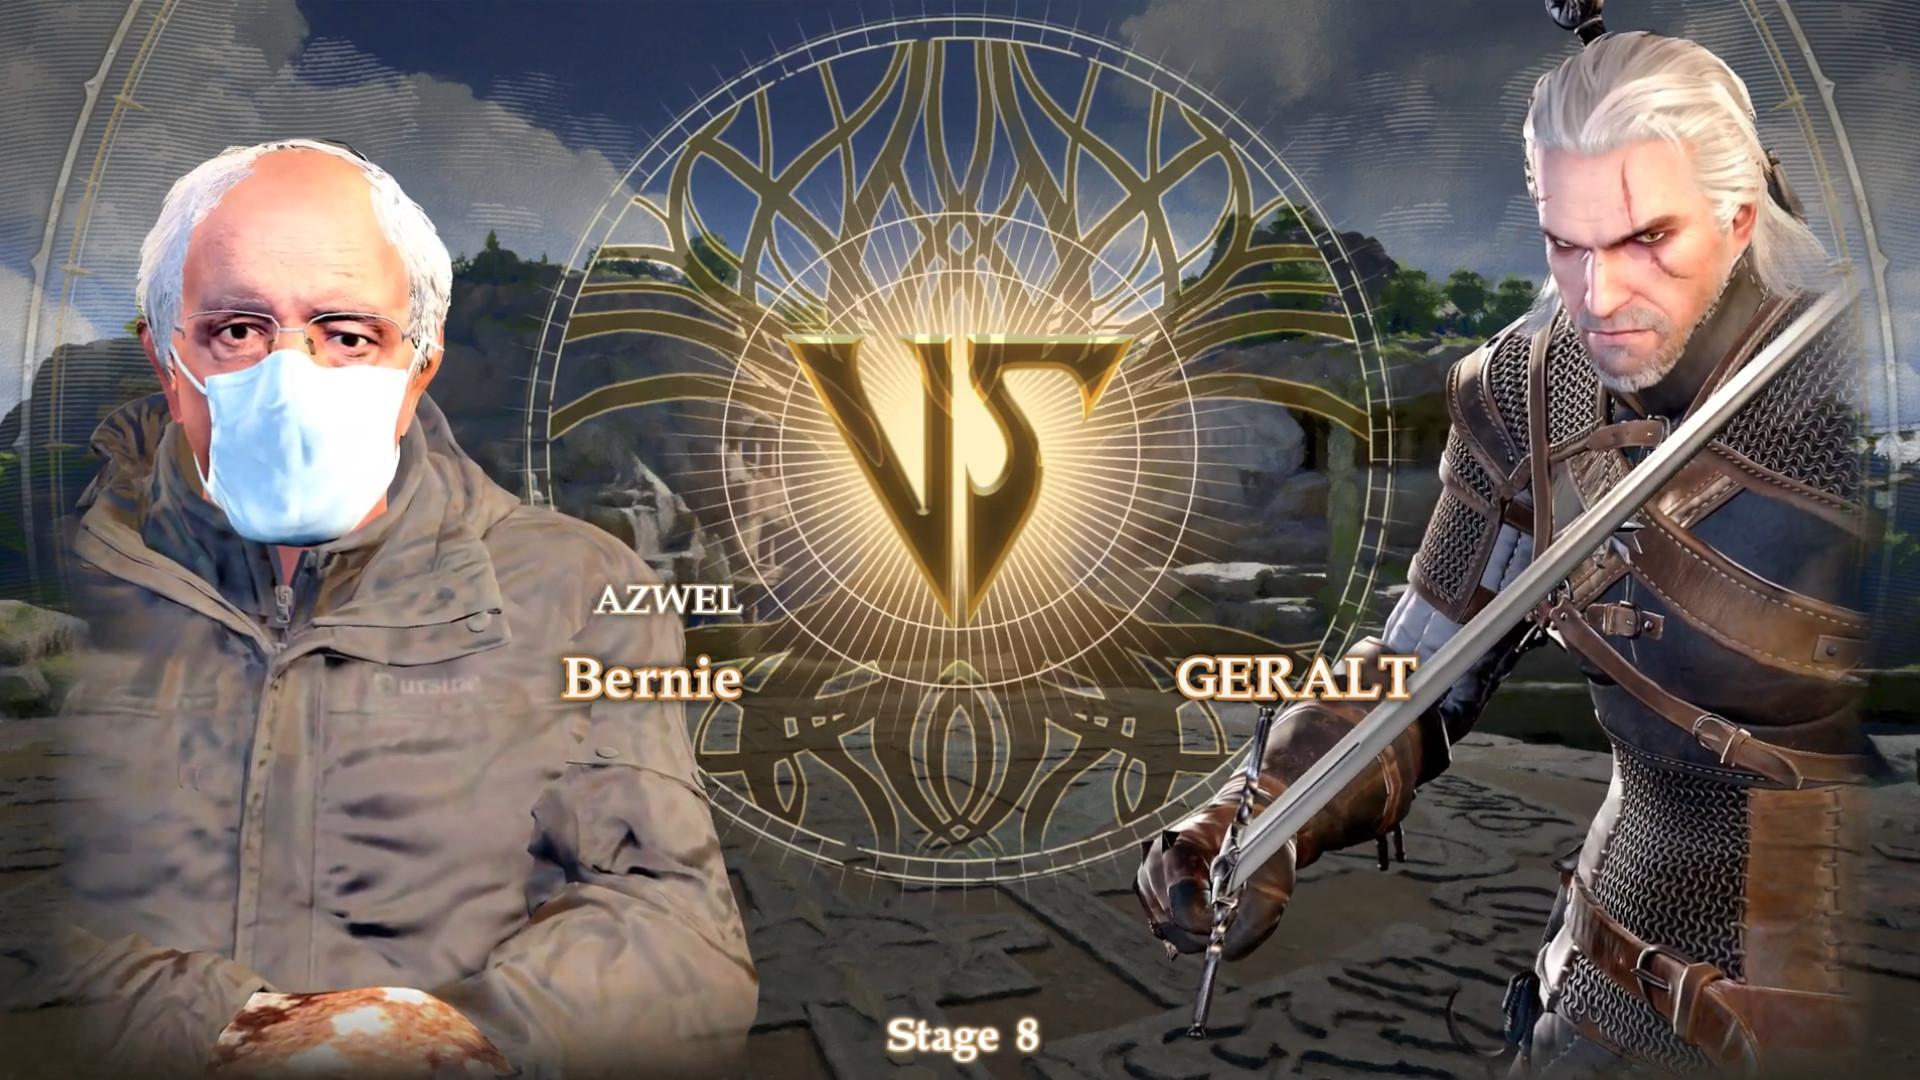 The Bernie Sanders meme is now a playable Soulcalibur 6 character